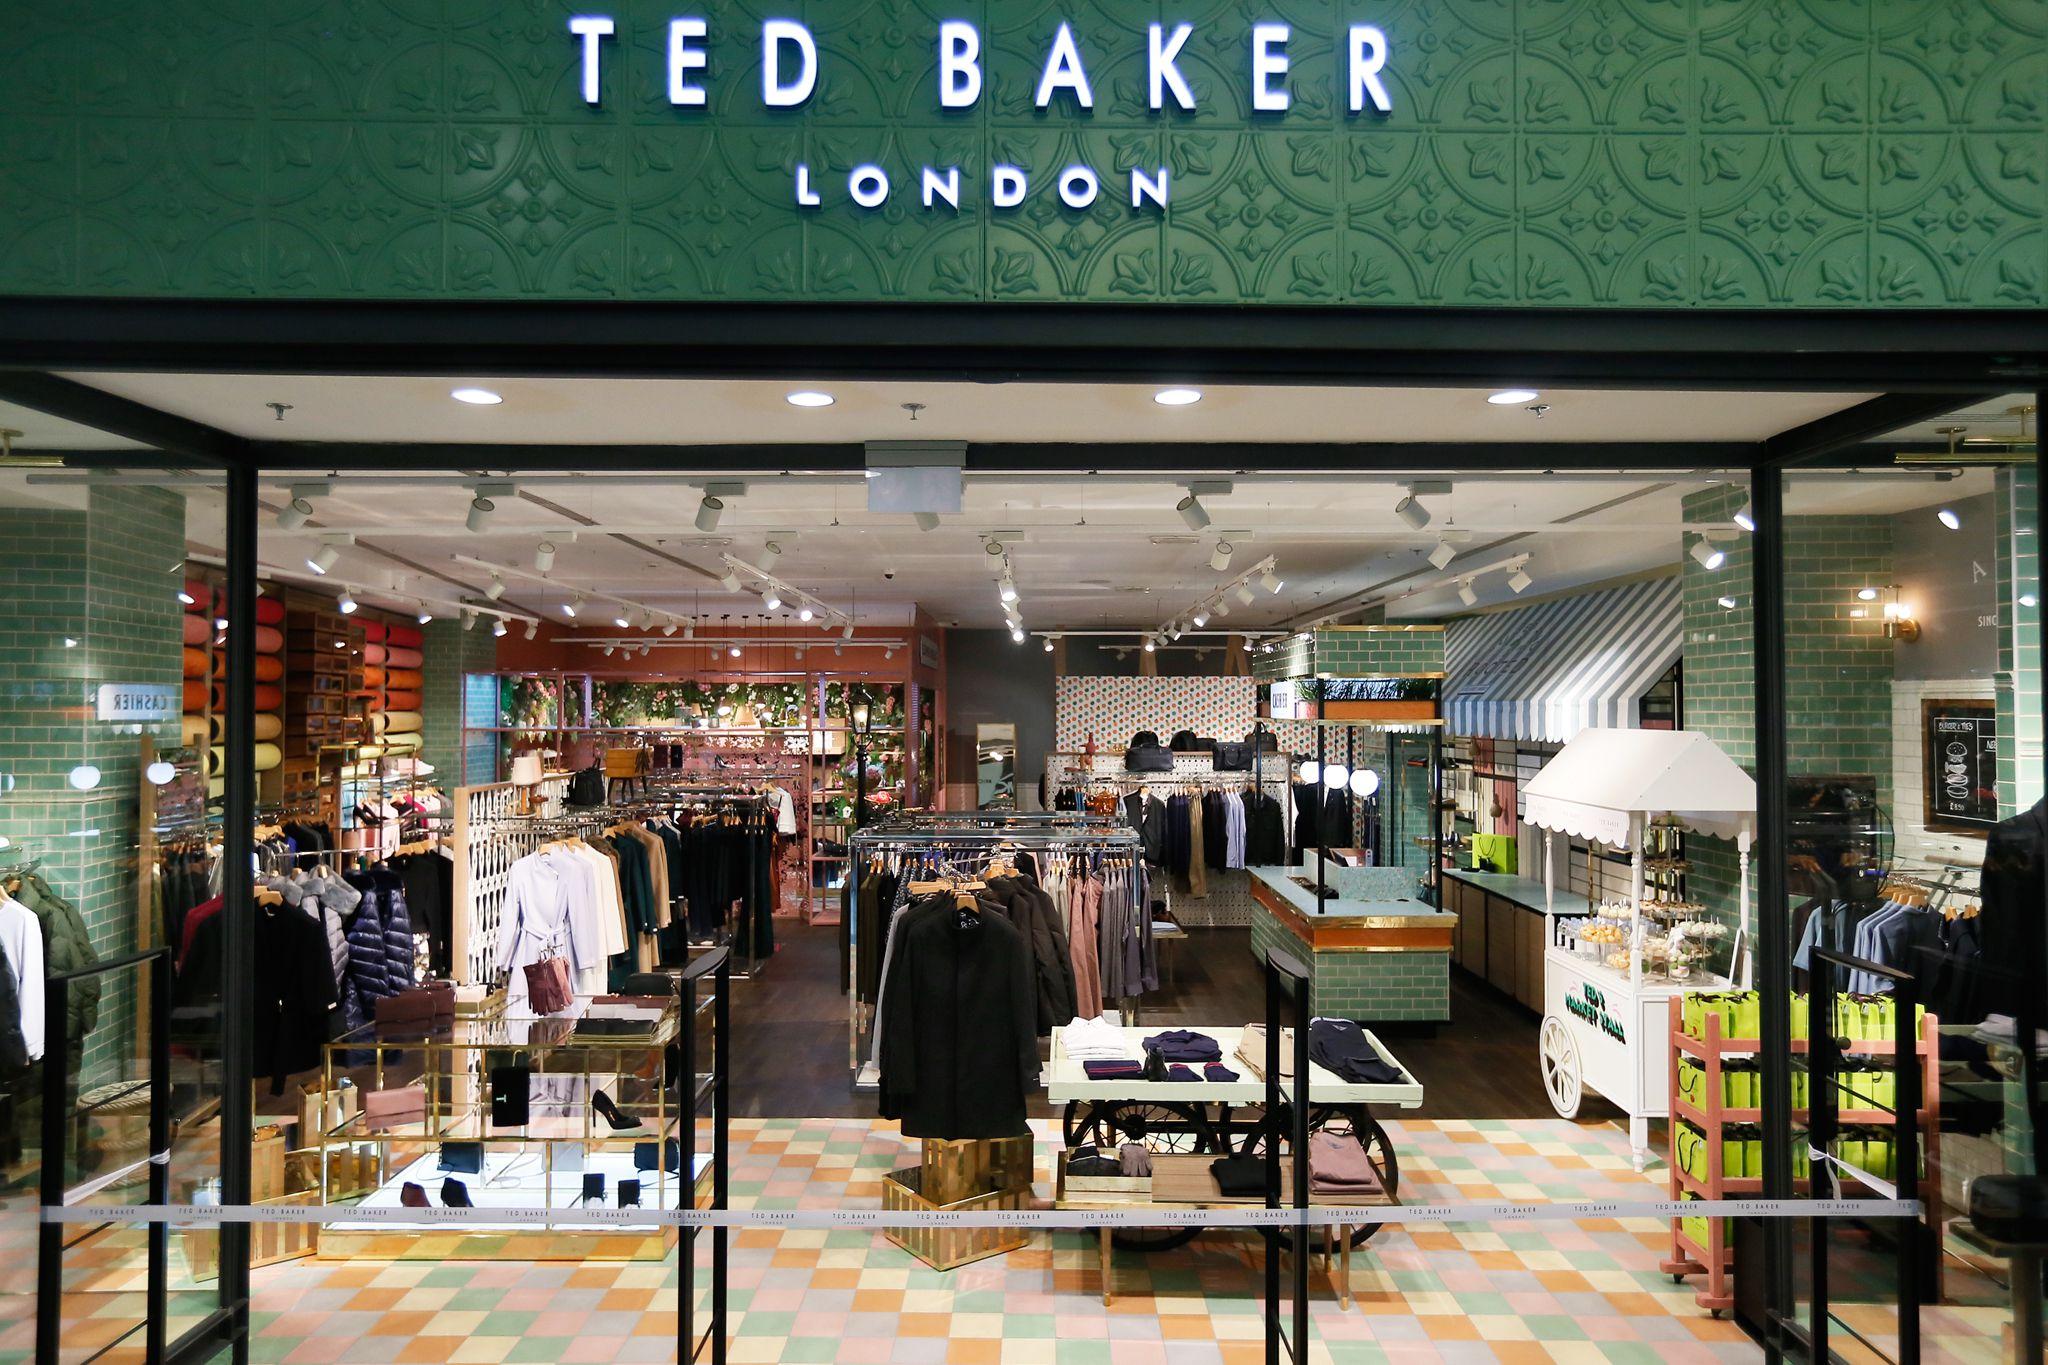 Britanski modni brand oduševio poznate na otvorenju prve zagrebačke trgovine